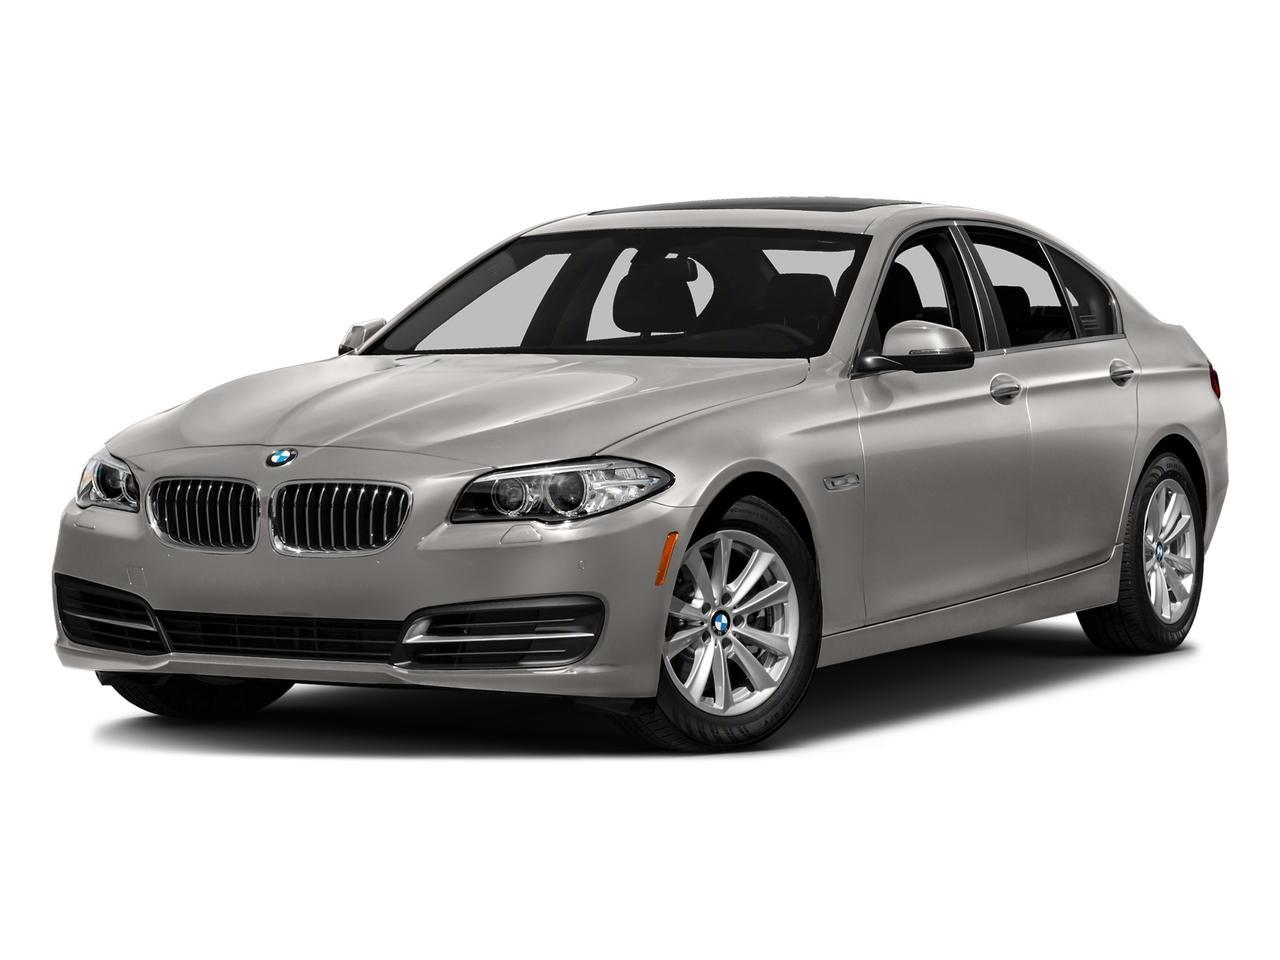 2016 BMW 528i Vehicle Photo in San Angelo, TX 76901